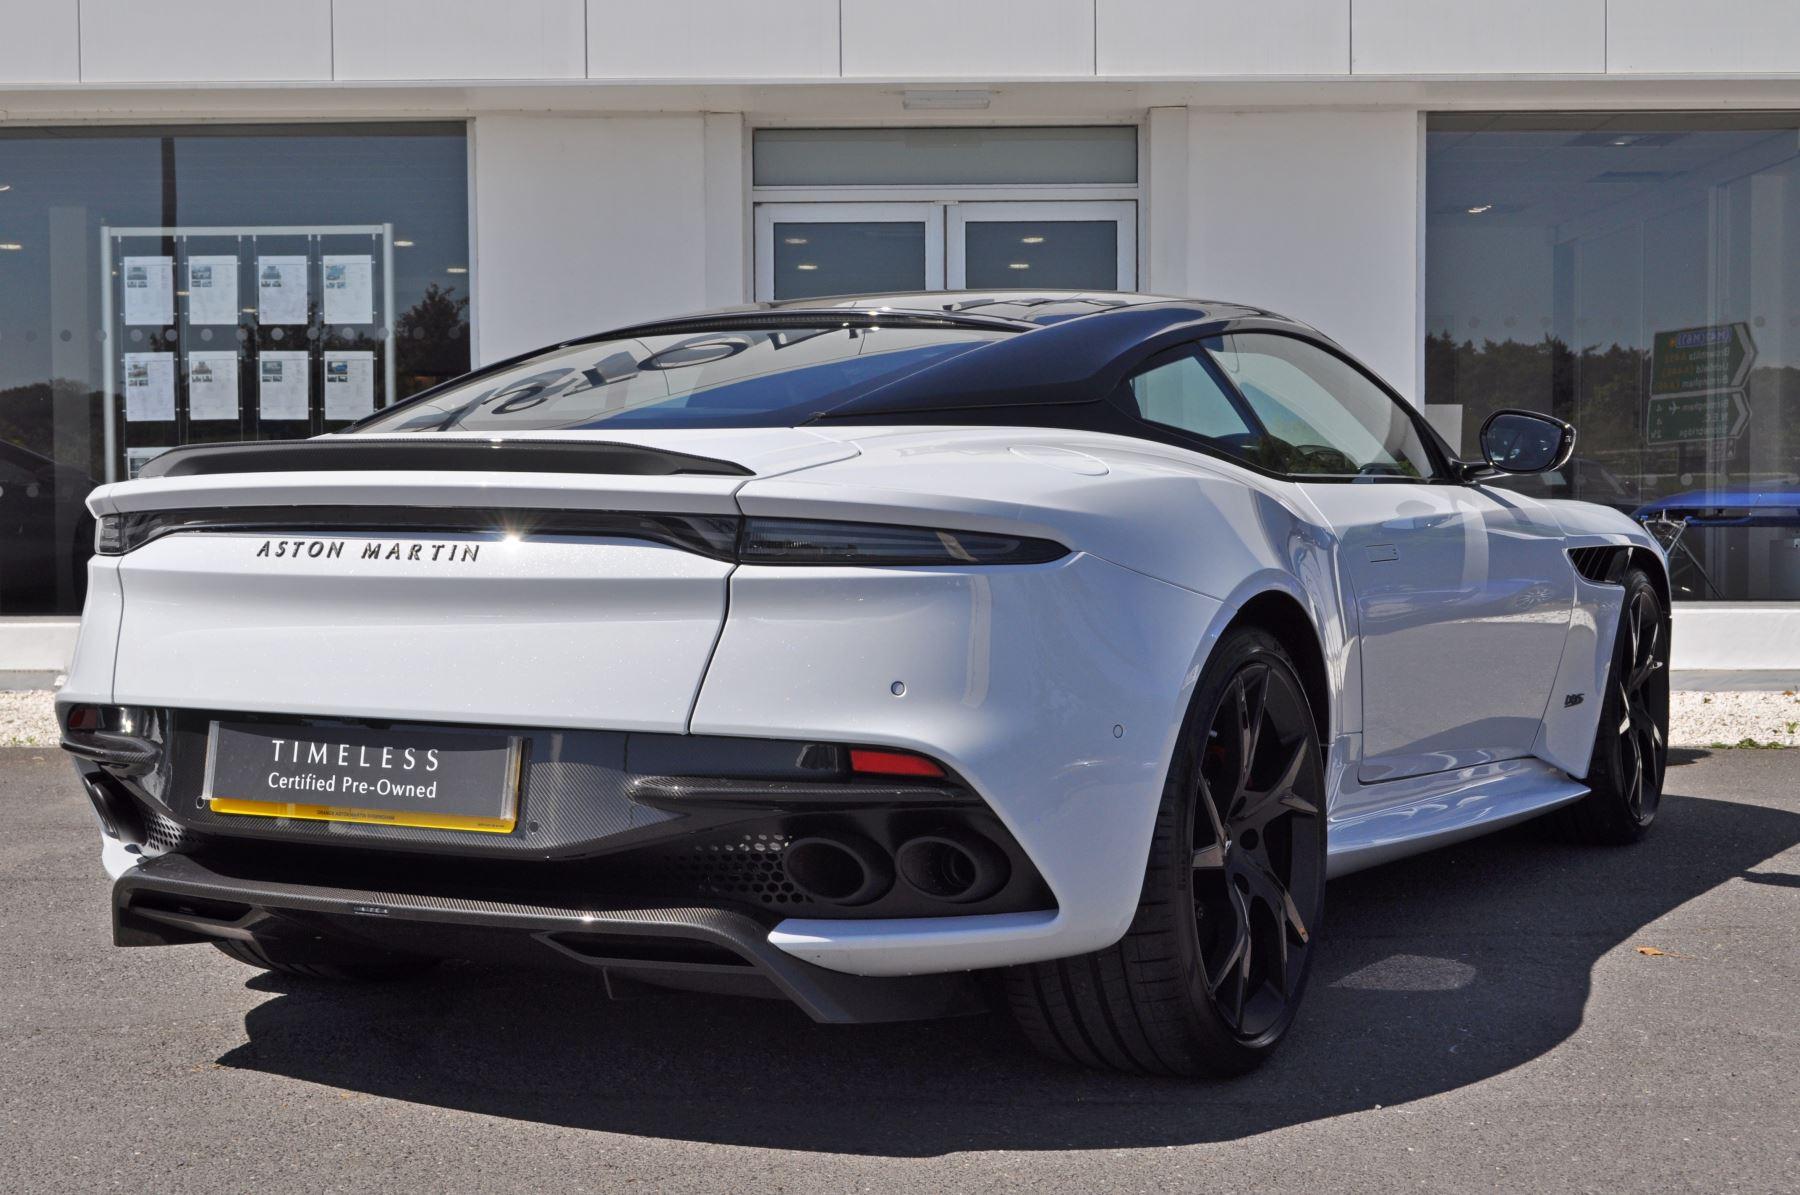 Aston Martin DBS V12 Superleggera 2dr Touchtronic image 16